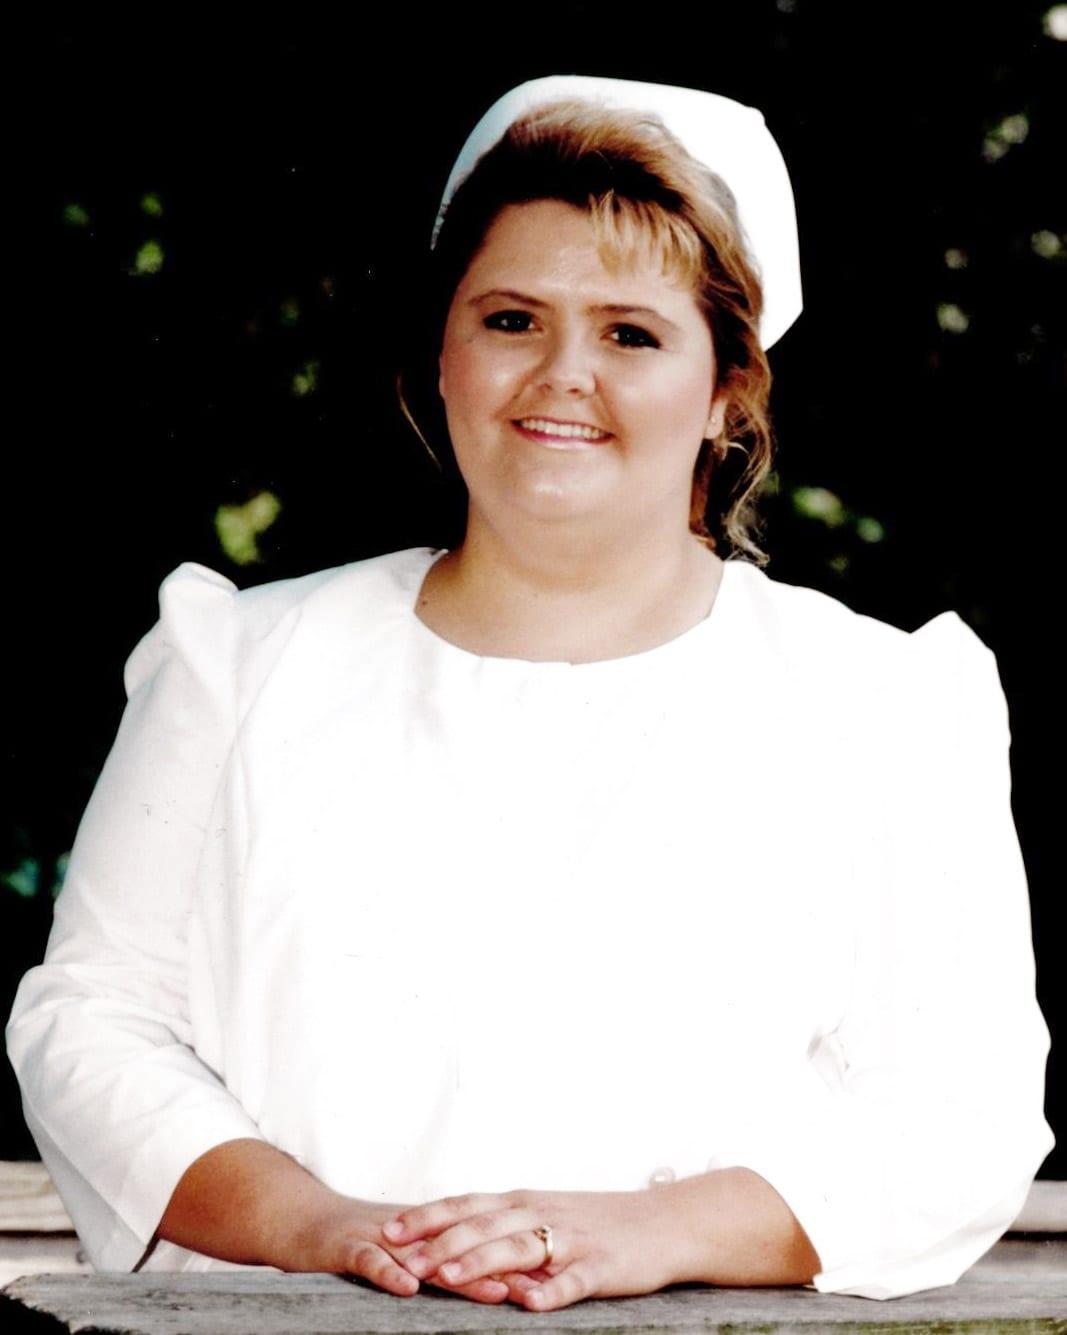 Cristi Leanne Fryar-Bissell – MyPulseNews.com